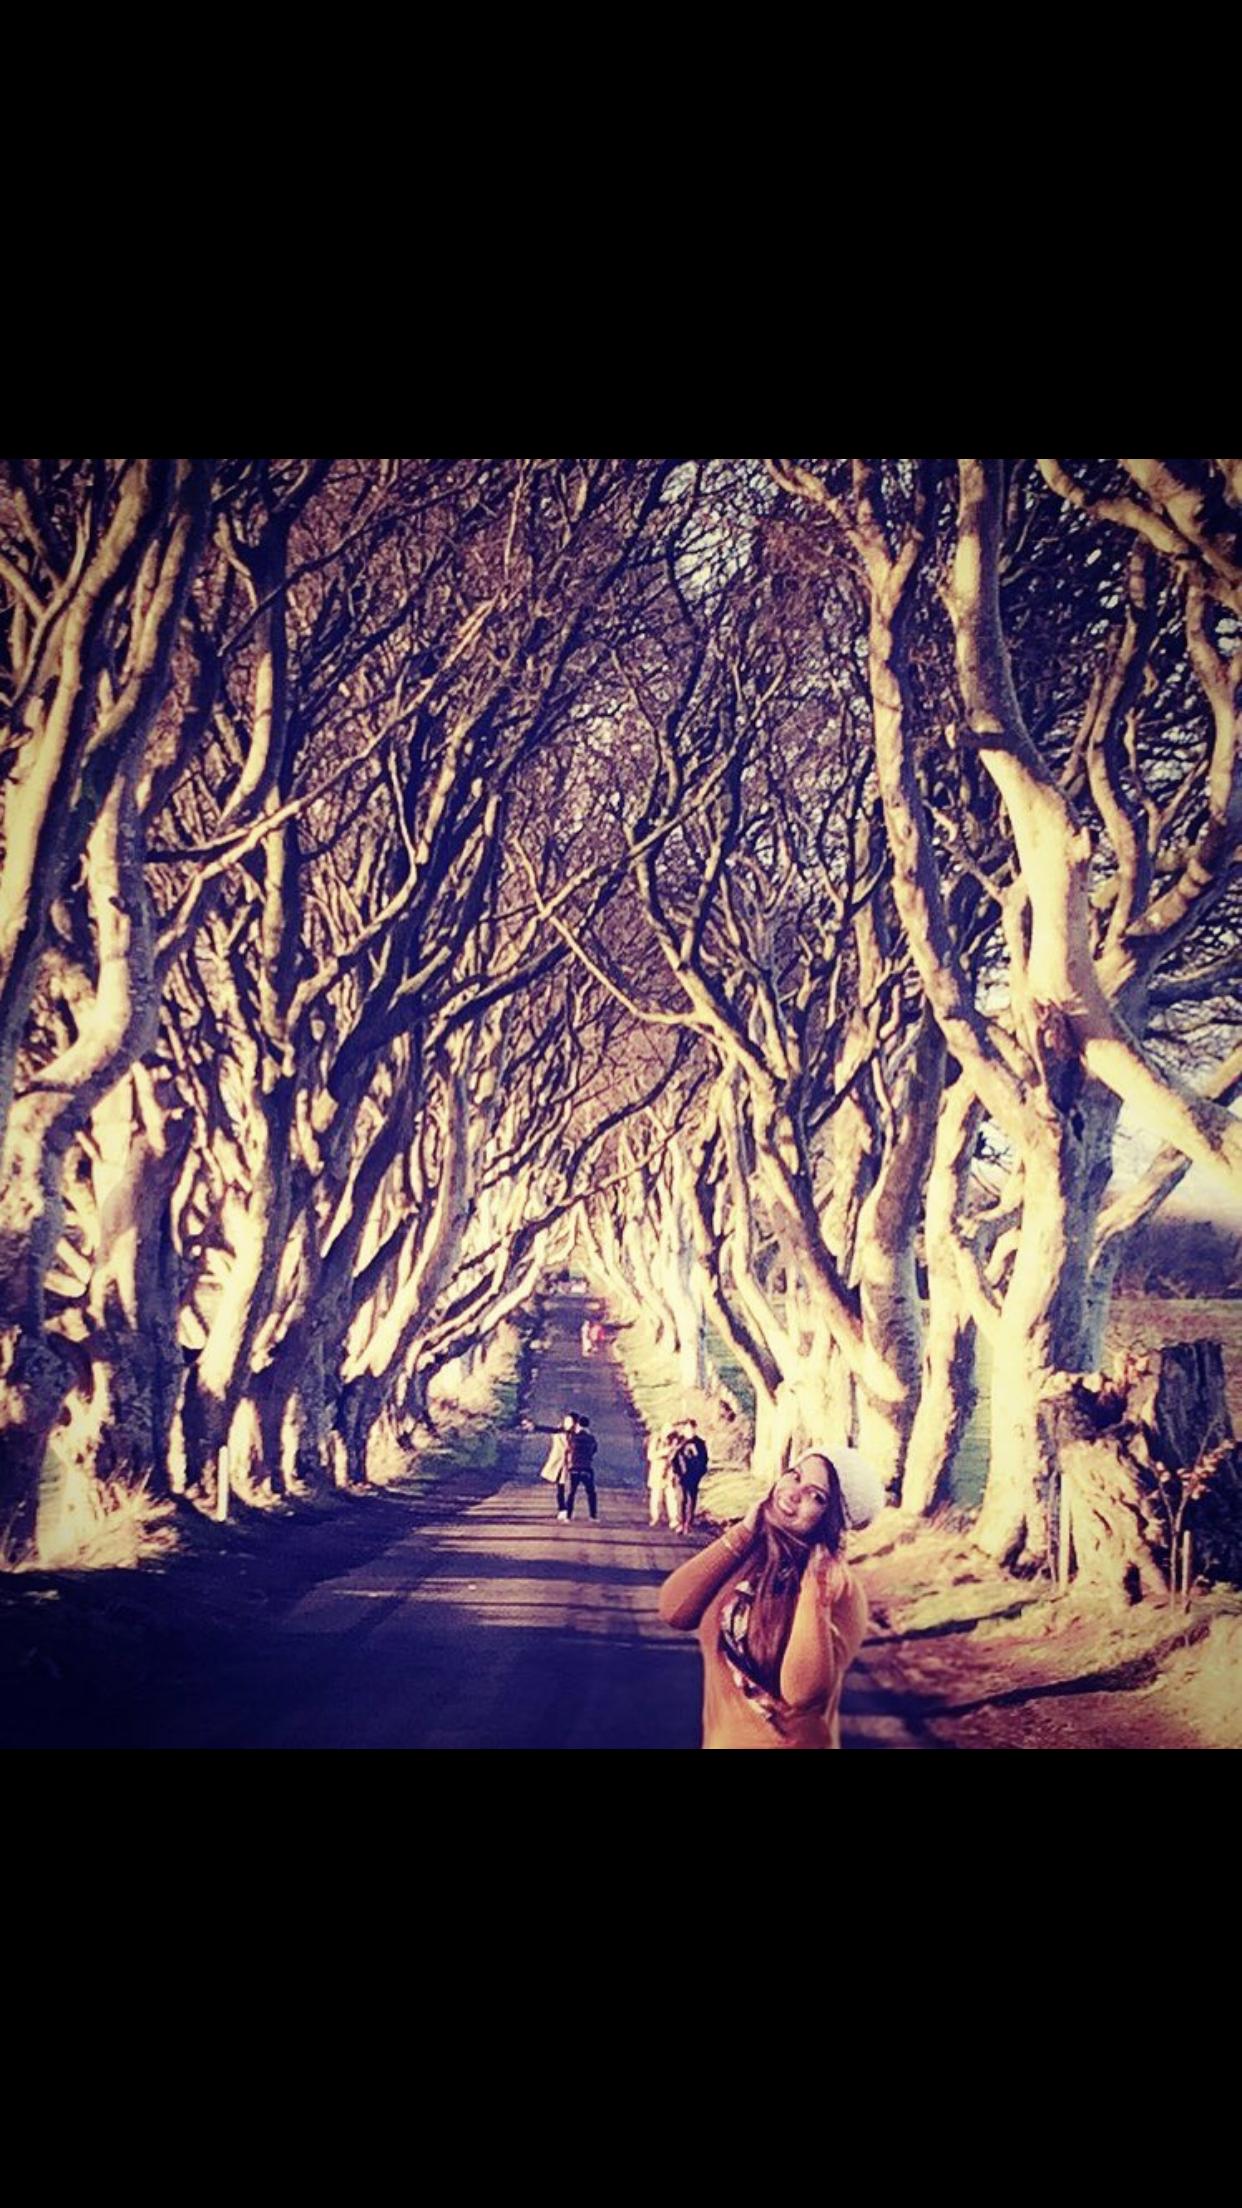 Photo of Belfast By aayushi gupta